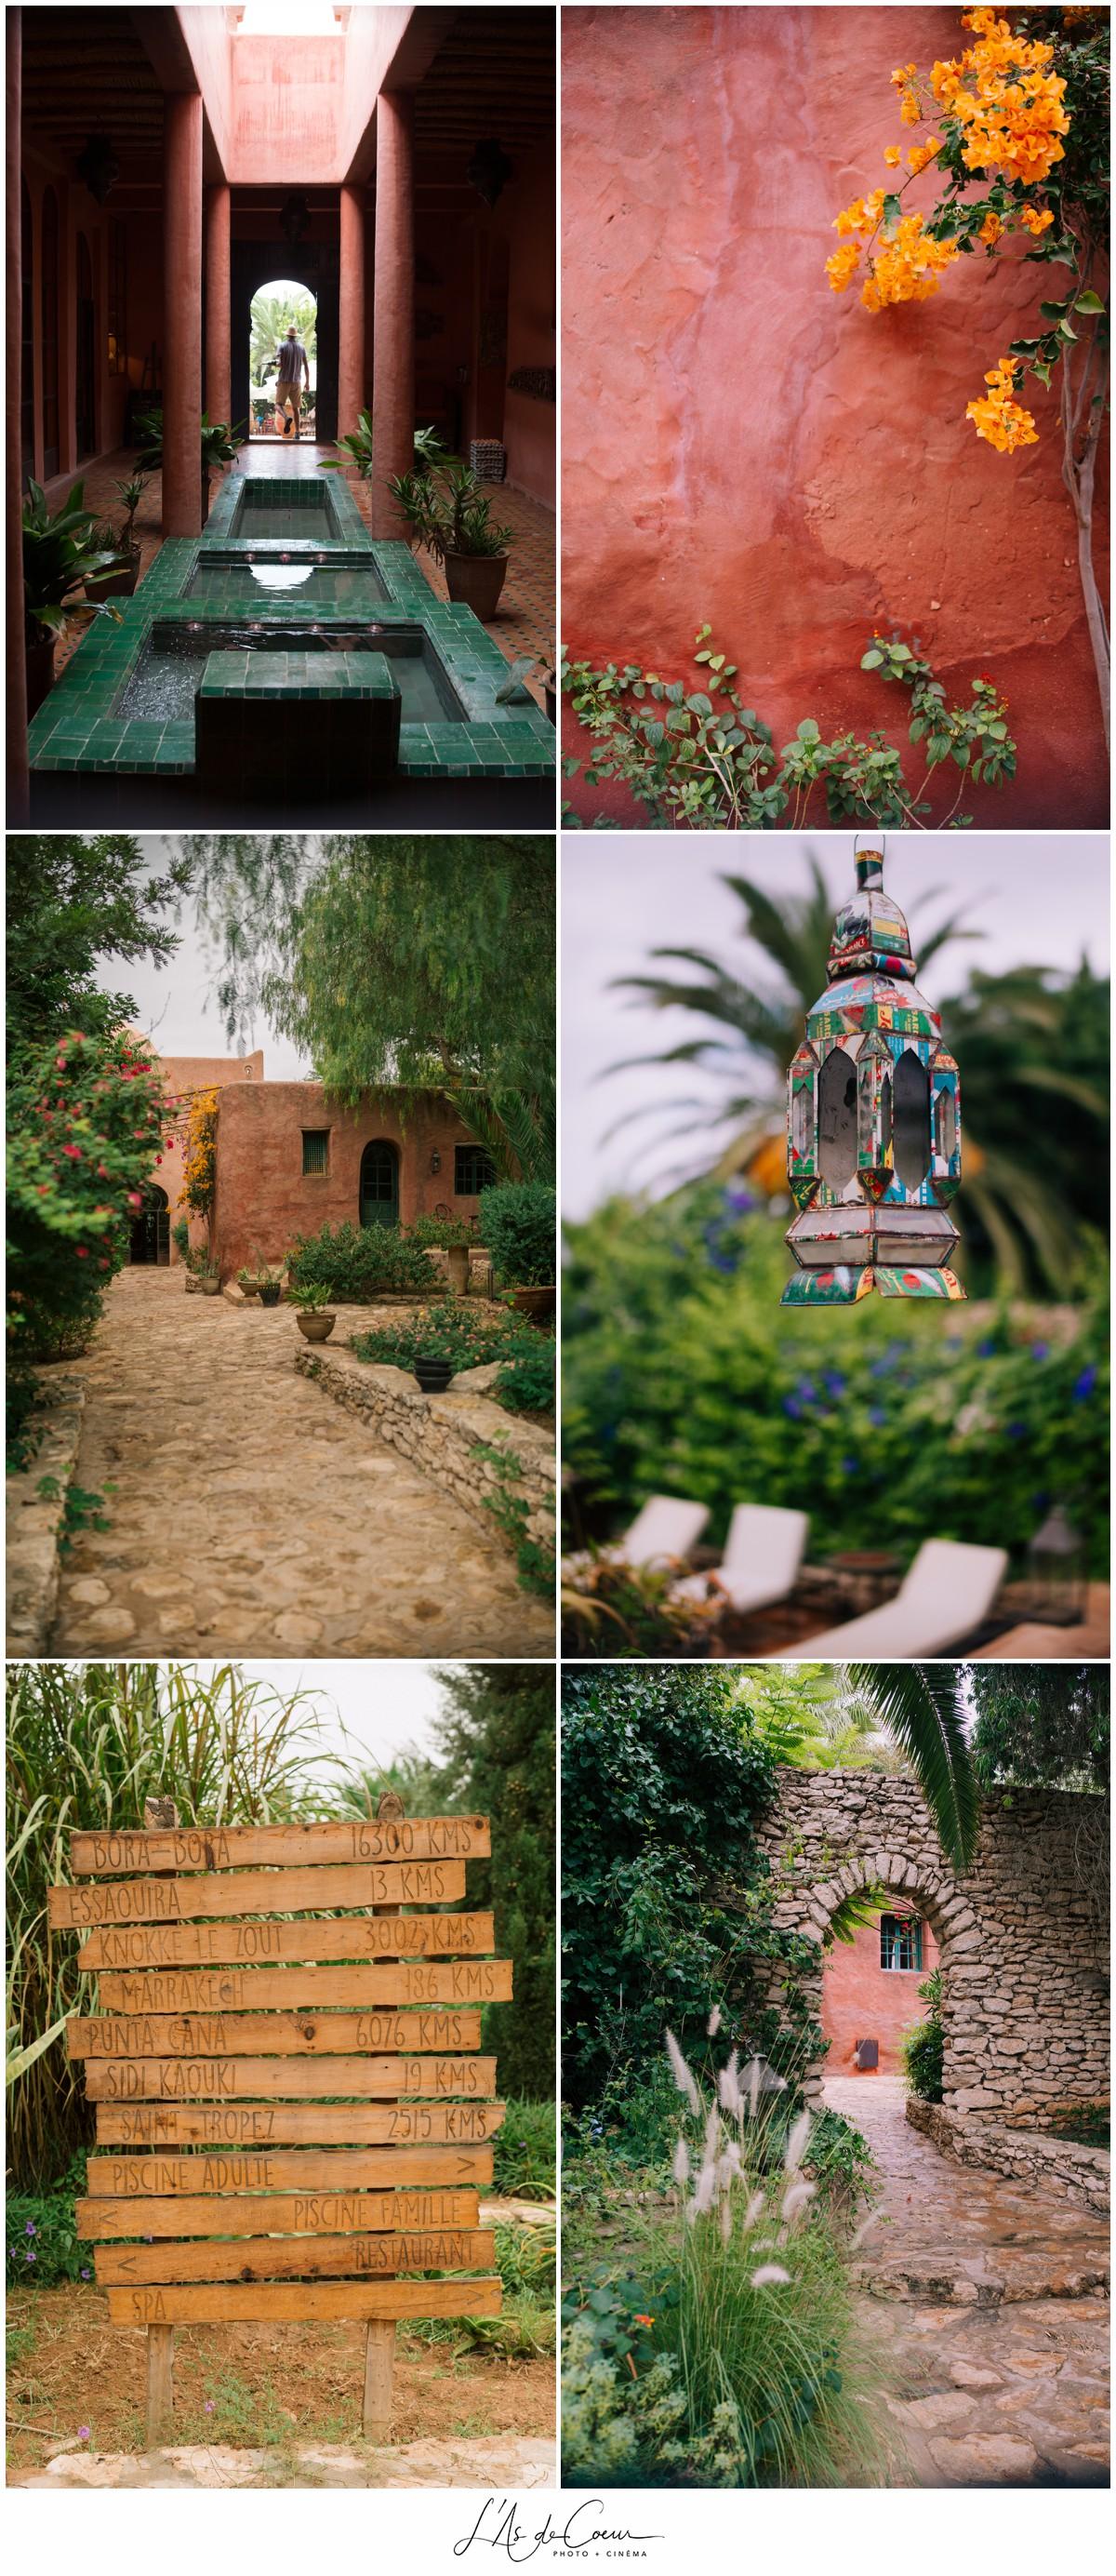 Photographe Mariage Essaouira le Jardin des Douars Maroc ©lasdecoeurphoto